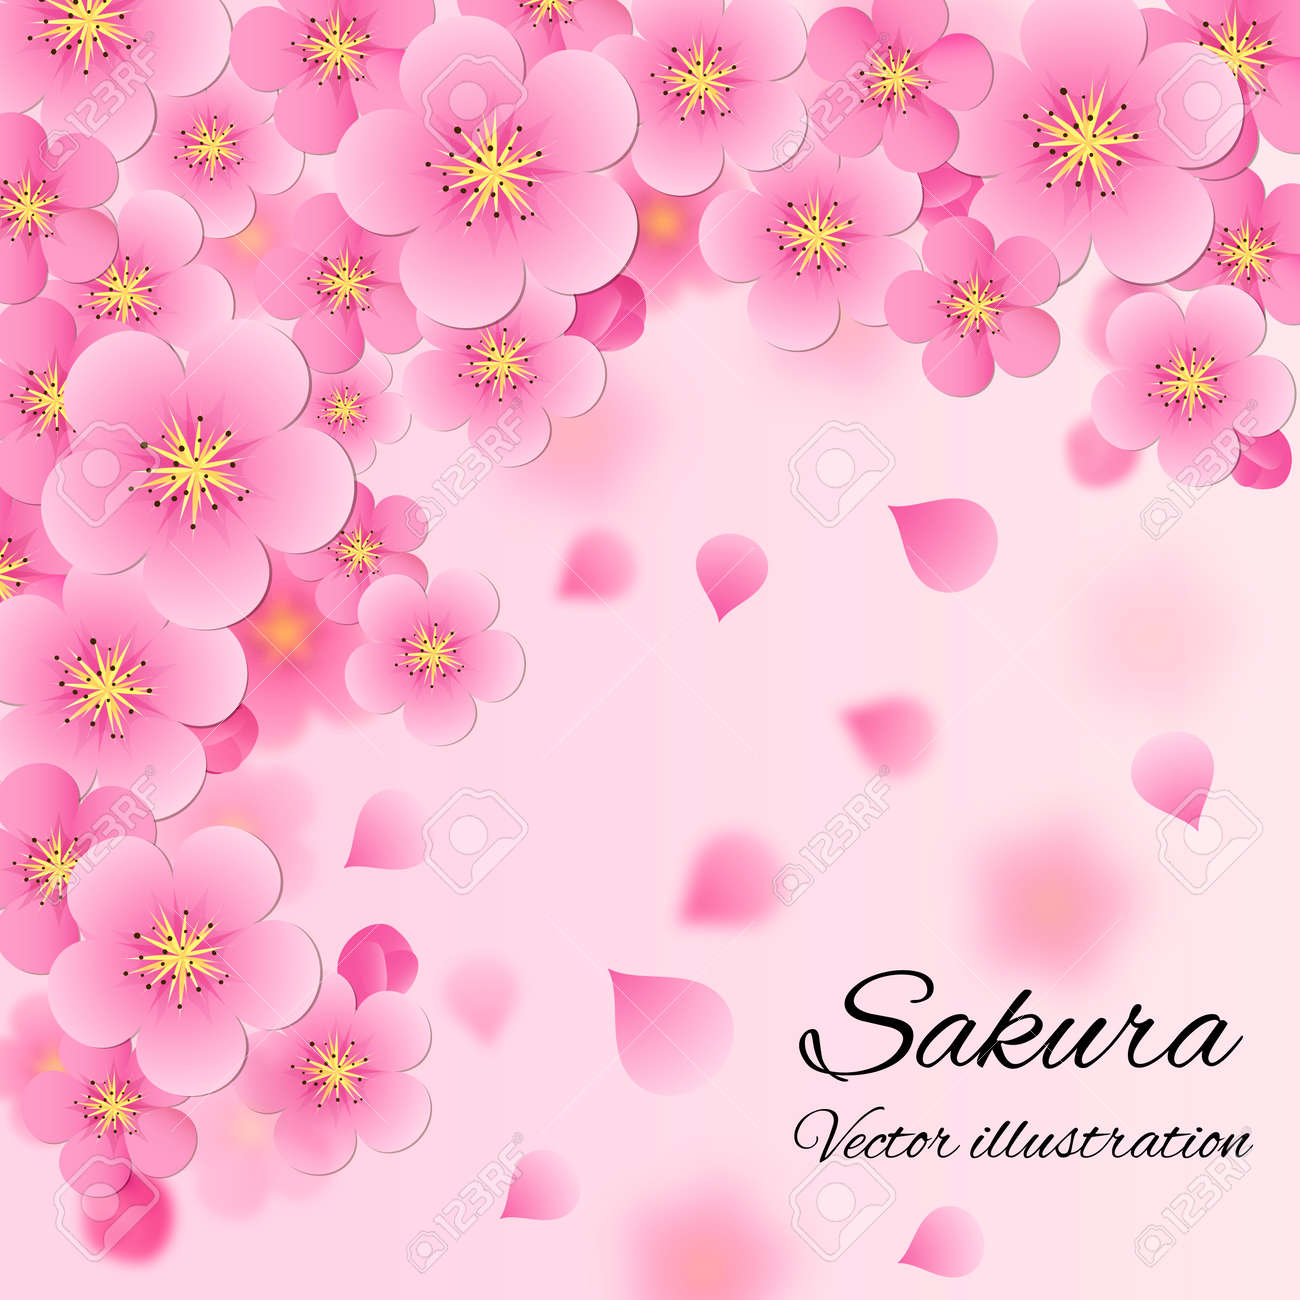 Elegant Soft Pink Color Cherry Flowers Sakura Background Royalty